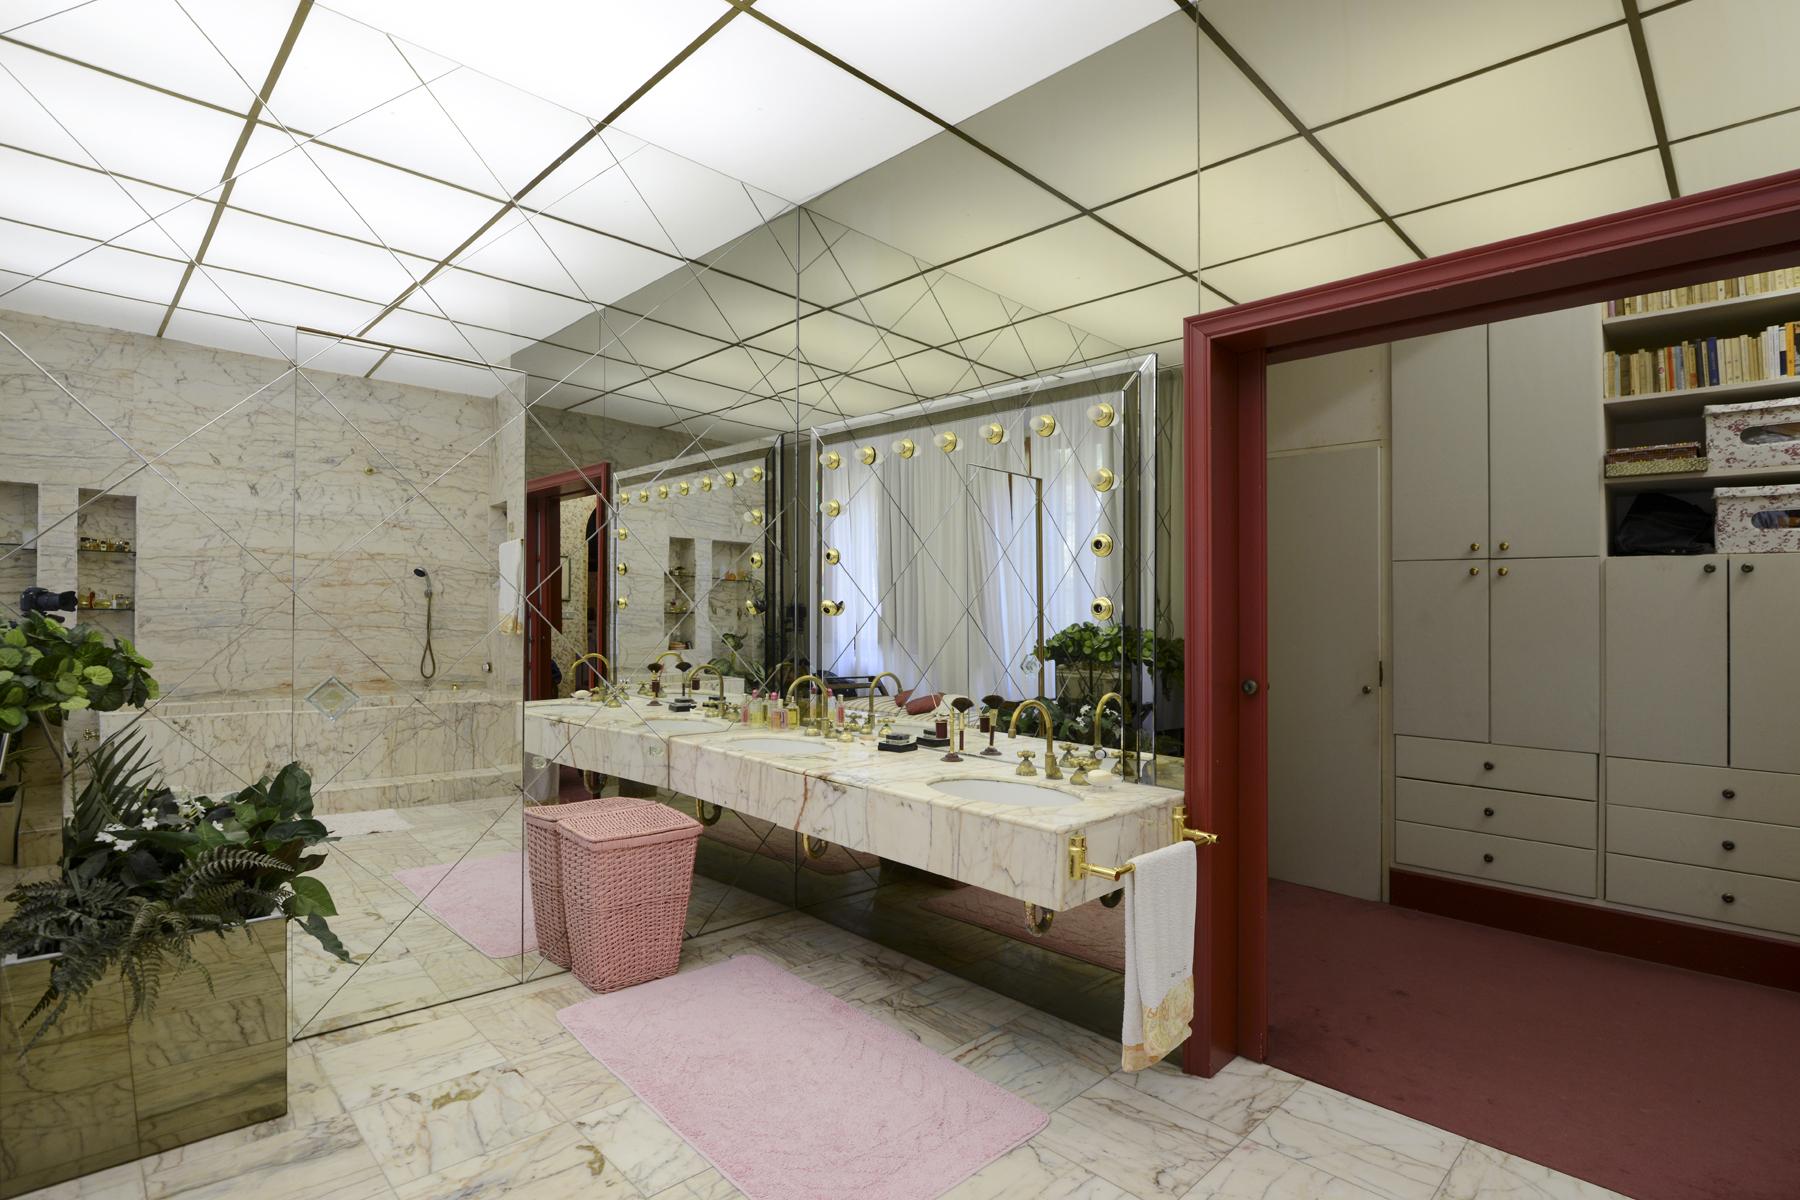 Villa in Vendita a Casciana Terme Lari: 5 locali, 1800 mq - Foto 23